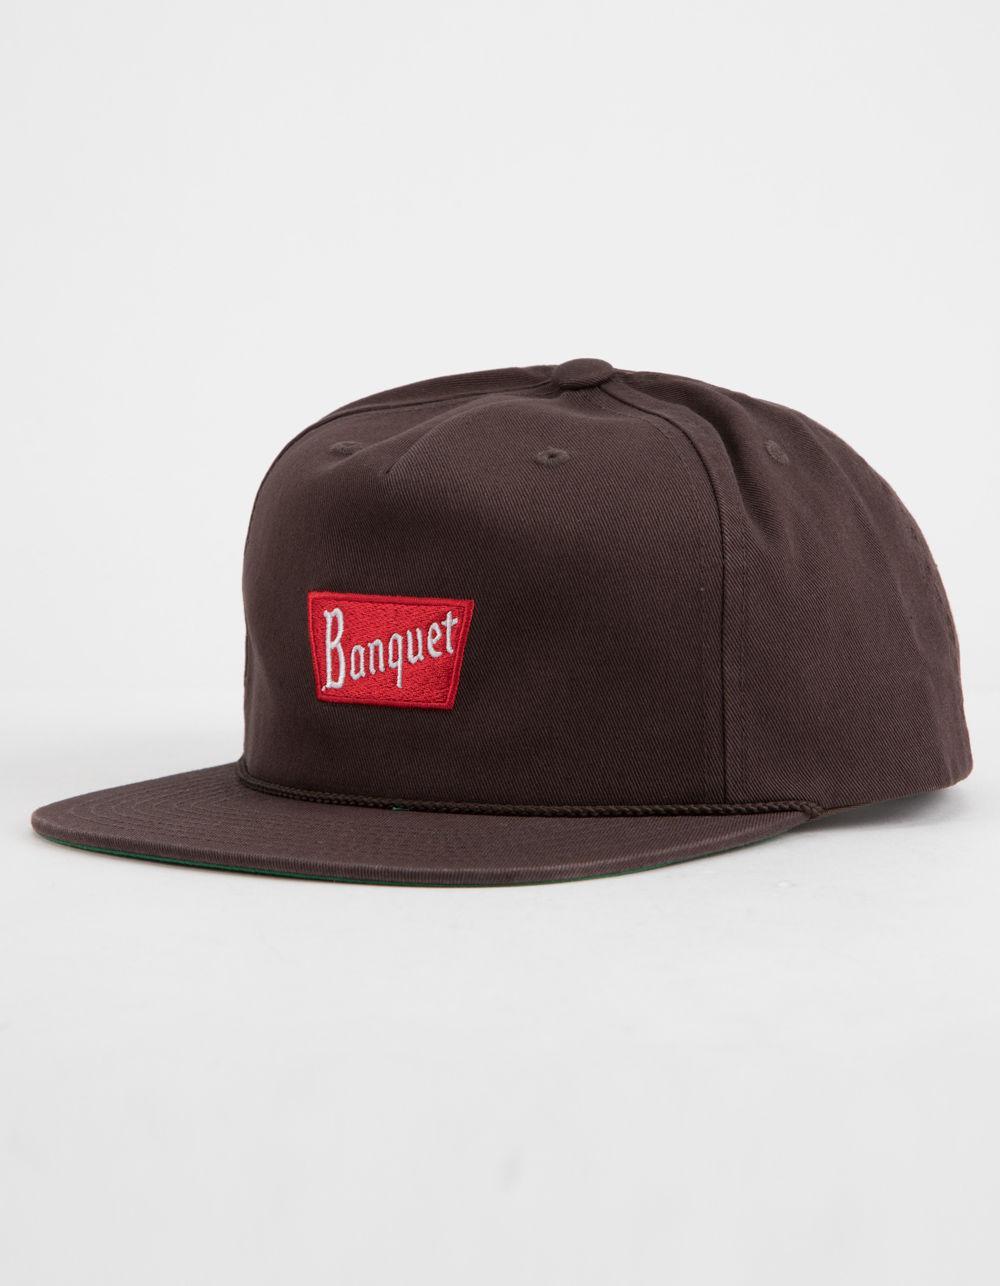 1a23f91b33ca54 ... sweden lyst brixton x coors banquet brown mens snapback hat in brown  for men 1e5e2 16e7e